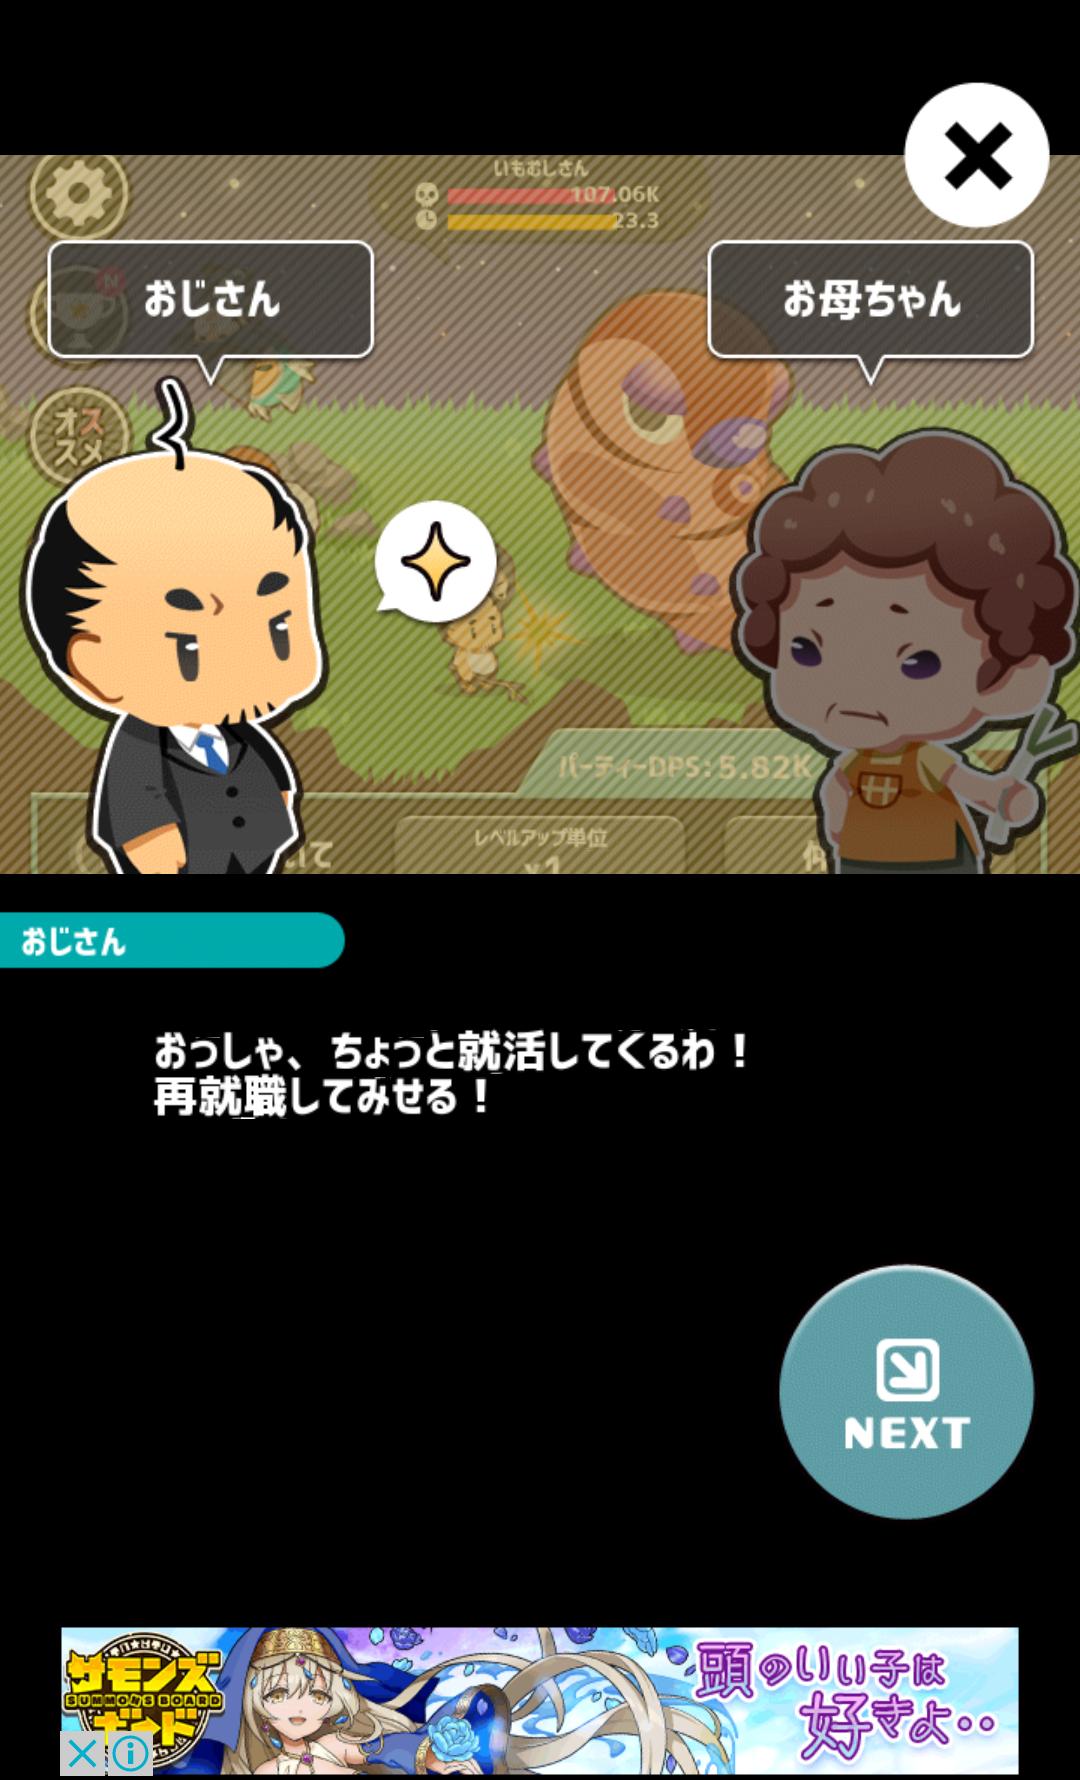 androidアプリ おじクエ - OJISAN QUEST -攻略スクリーンショット7